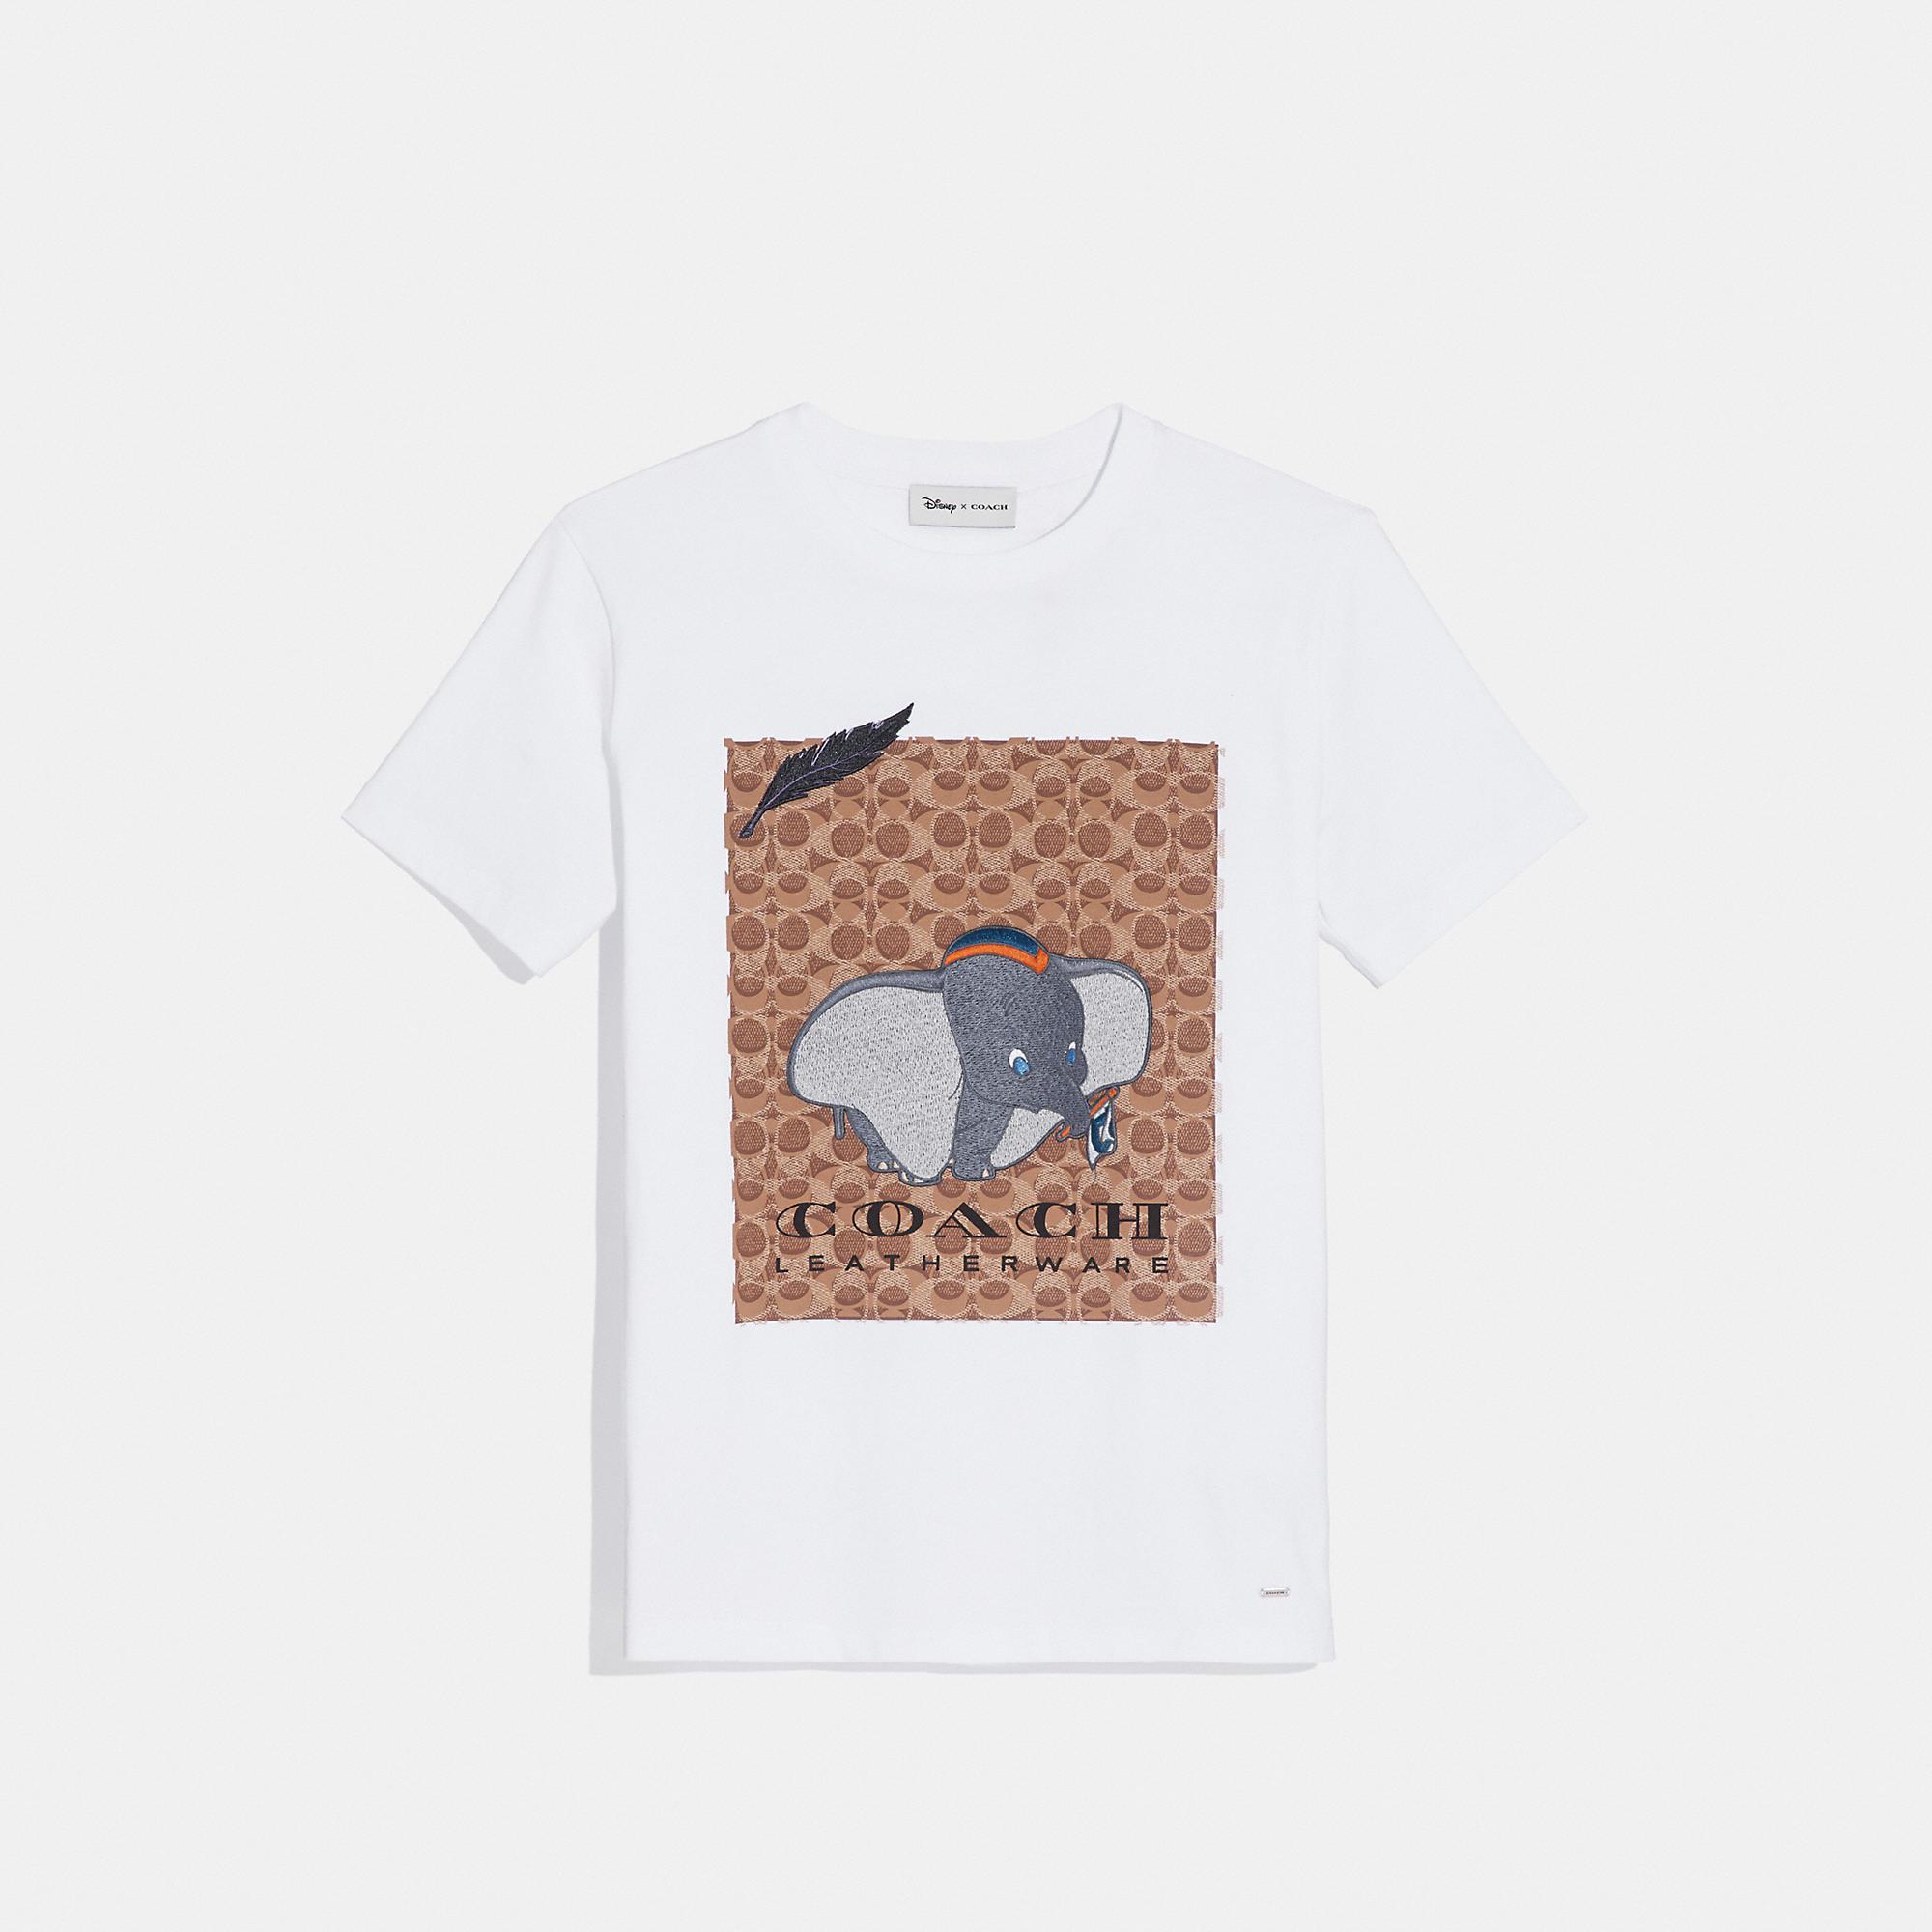 0ef382e53 Lyst - COACH X Disney Dumbo Signature T-shirt in White - Save 12%